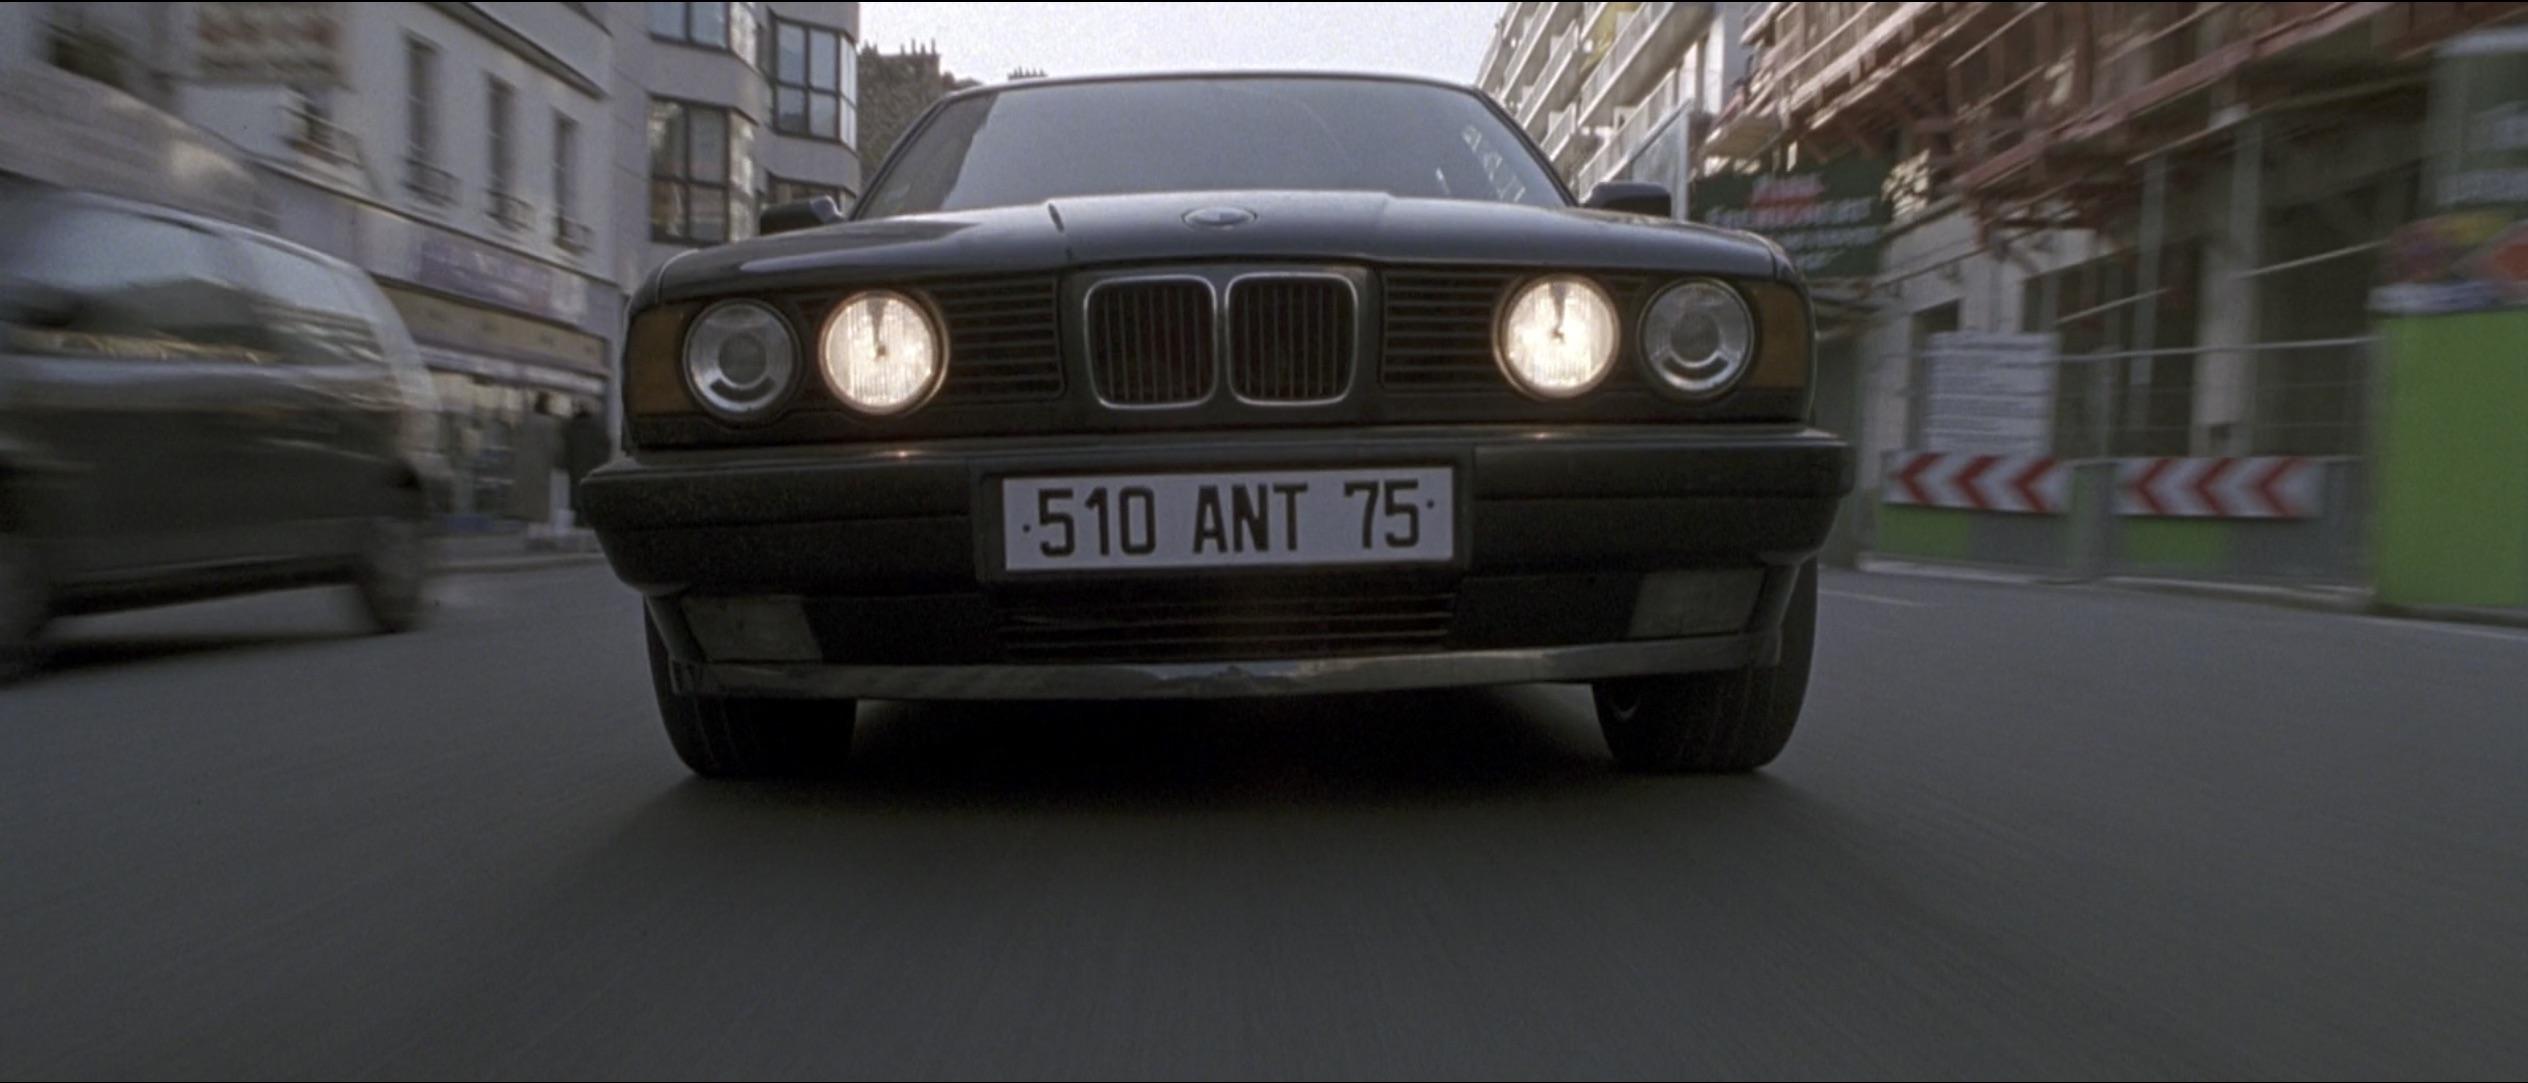 Ronin BMW headlights on